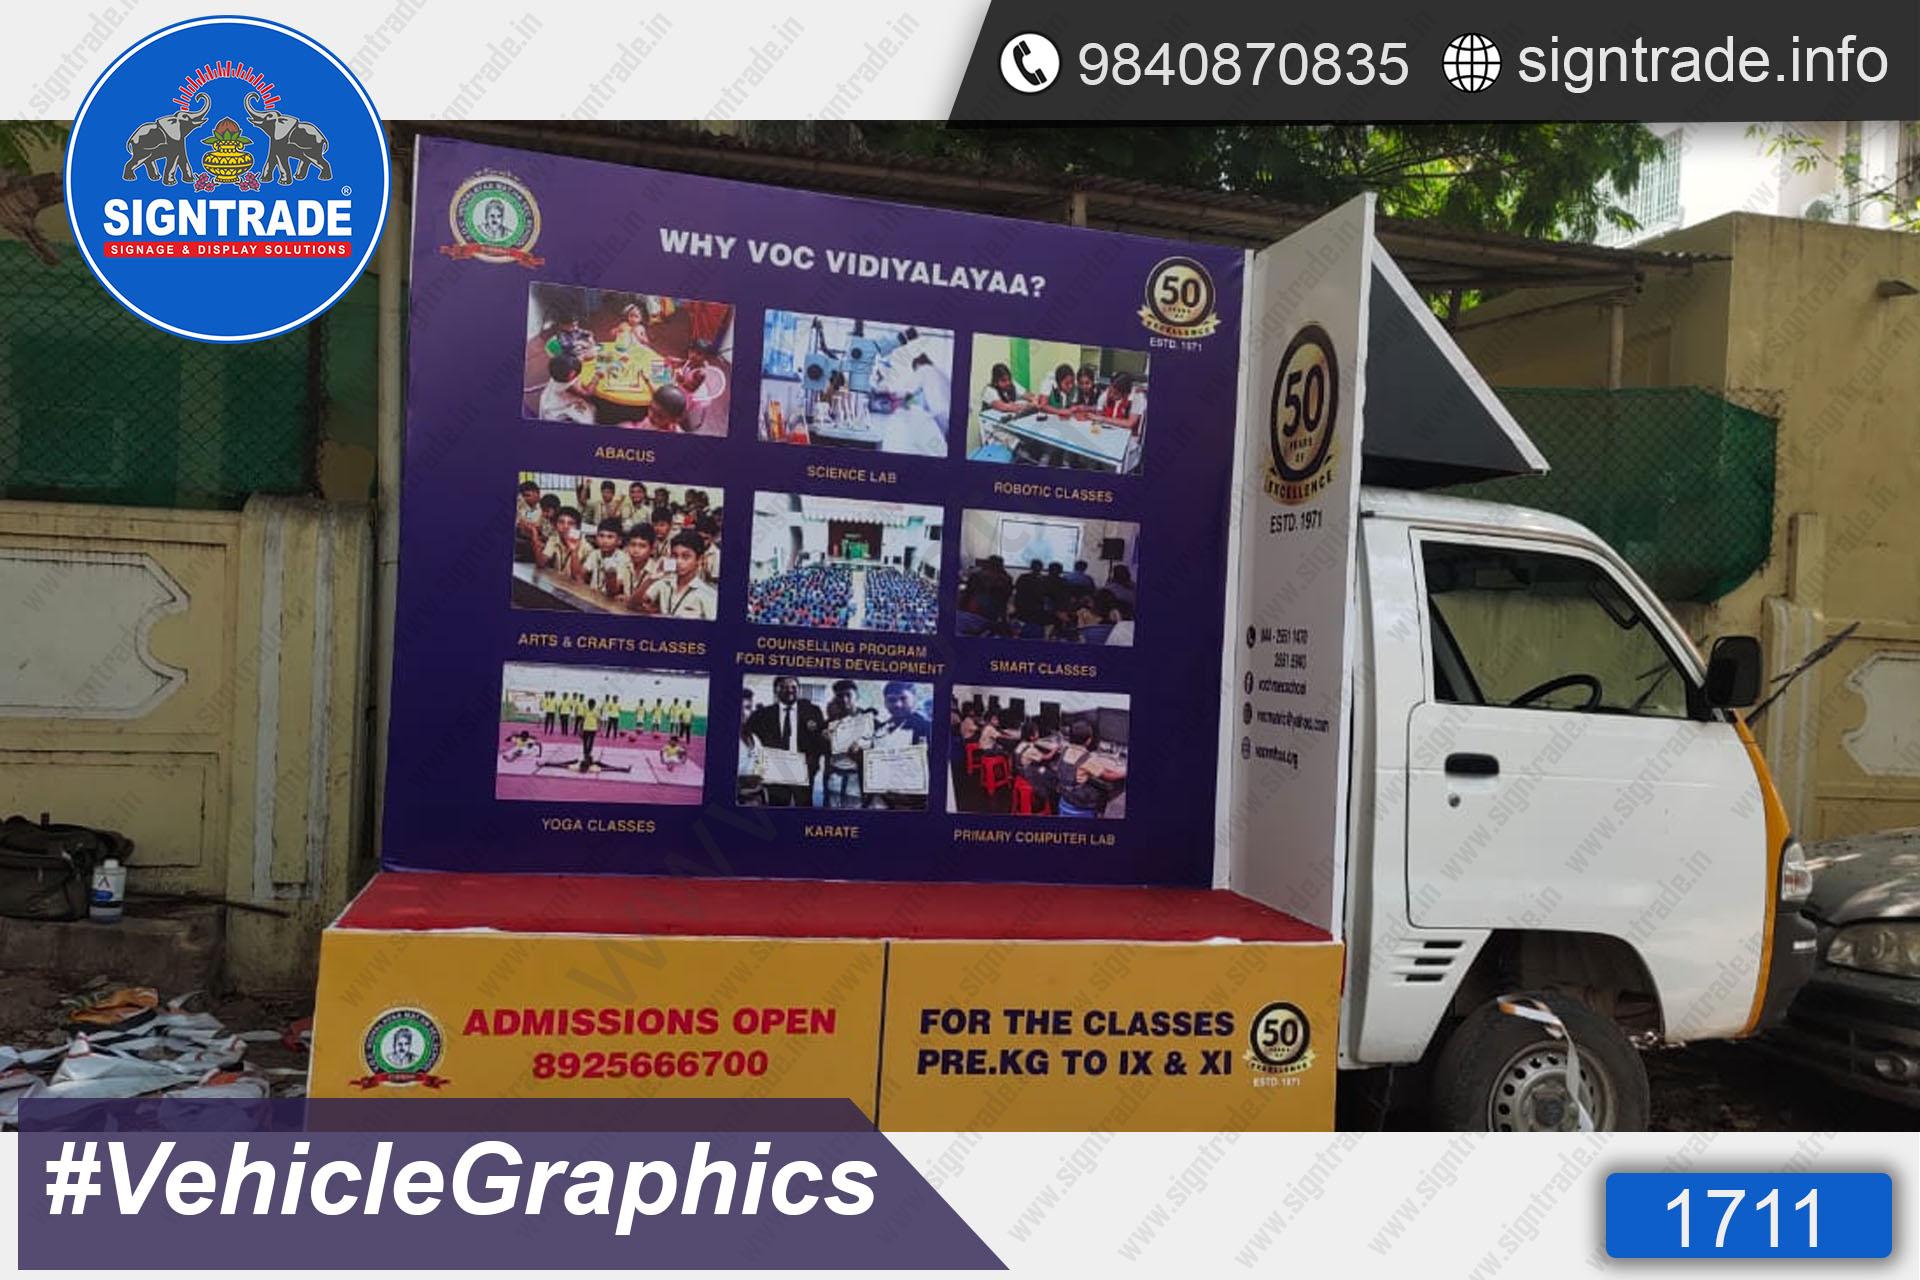 Voc Vidiyalayaa School, Chennai - SIGNTRADE - Vinyl Printing, Vehicle Graphics Service in Chennai